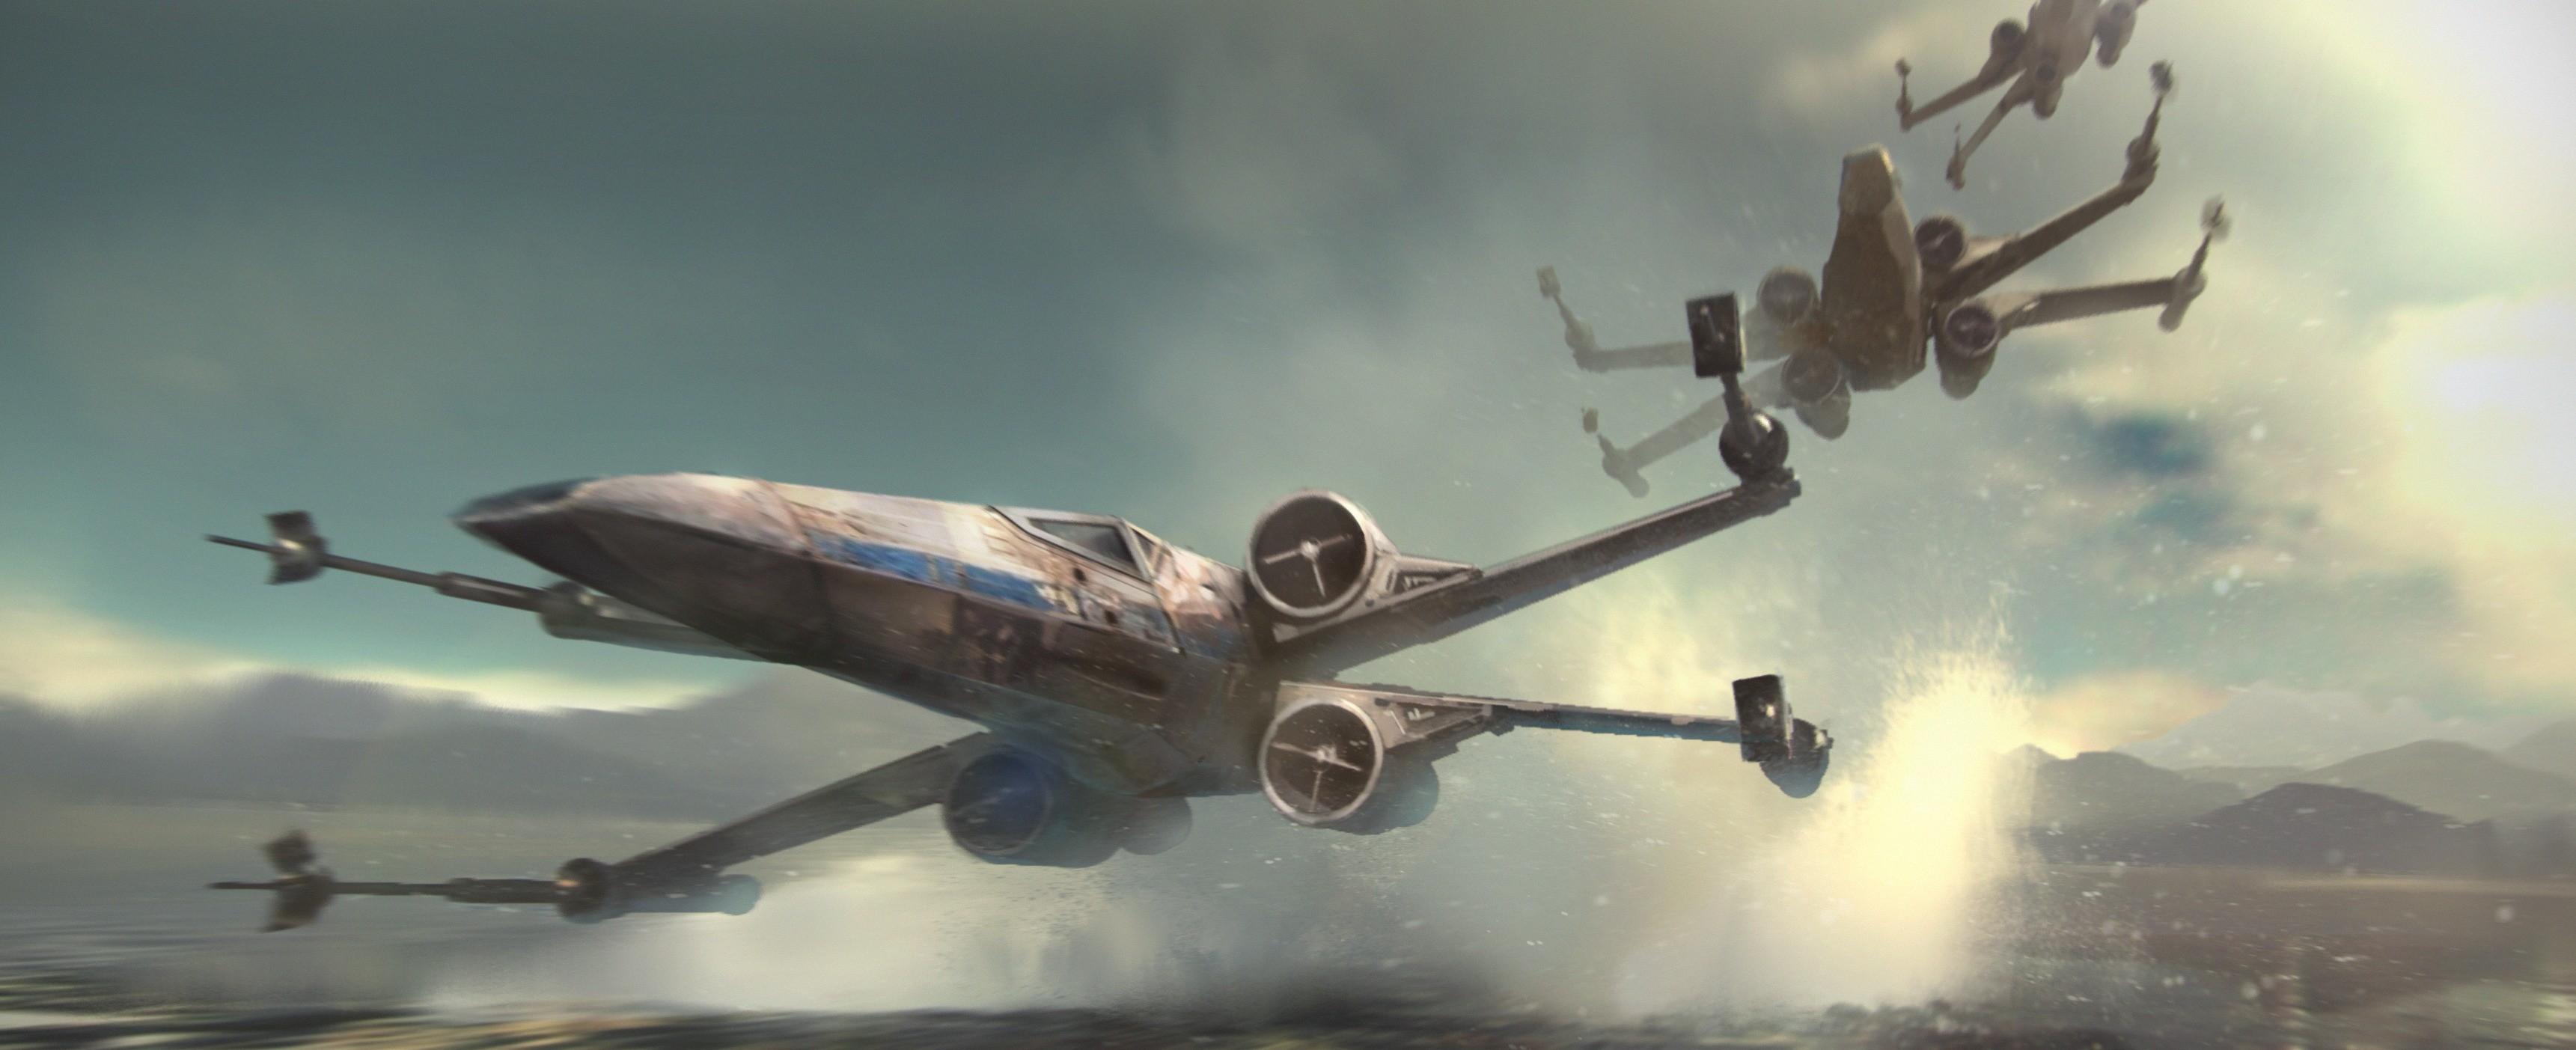 Star Wars Episode VII   The Force Awakens [Wallpapers HD]   Taringa 3442x1403